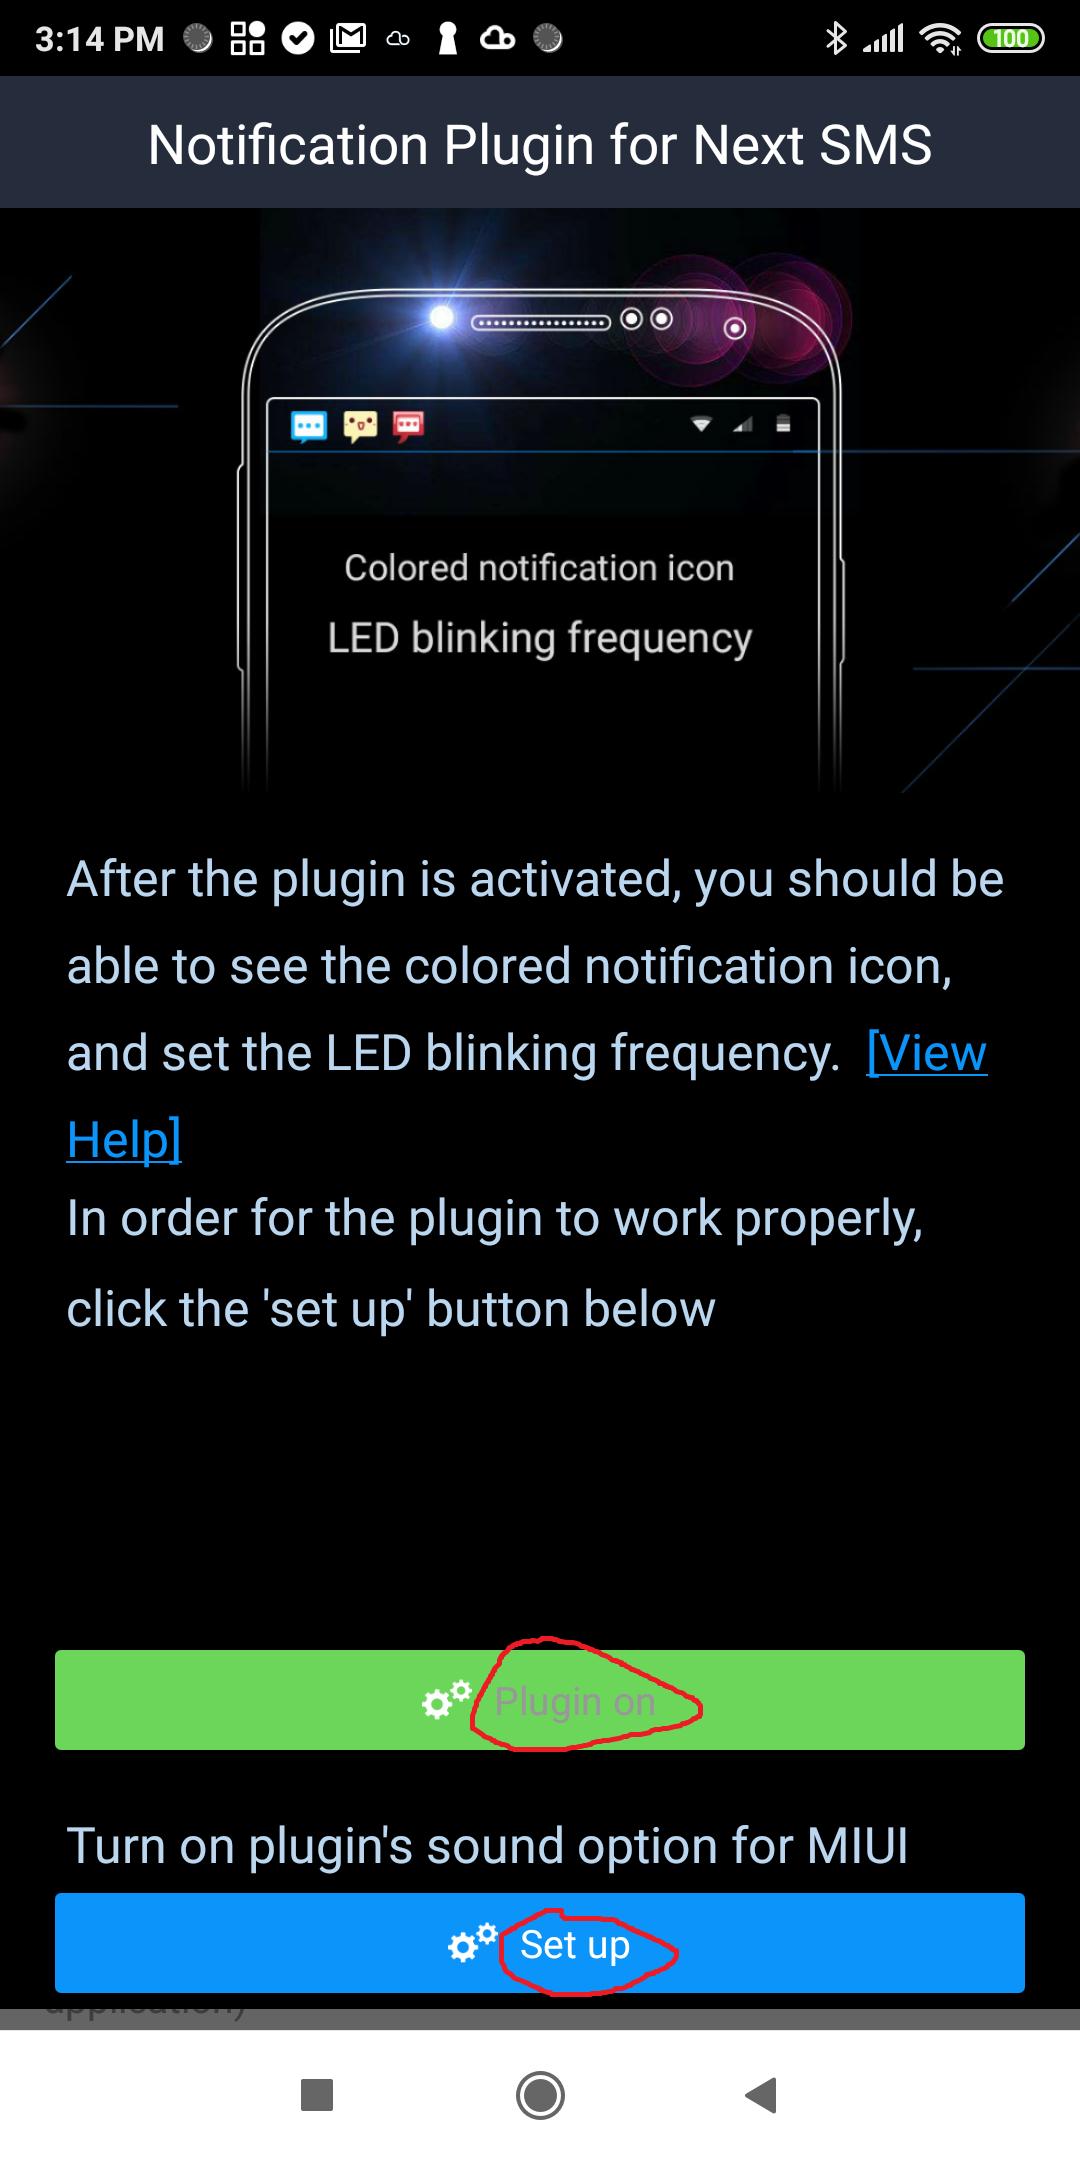 Screenshot_2020-01-22-15-14-20-058_com.handcent.plugin.notifysp.png